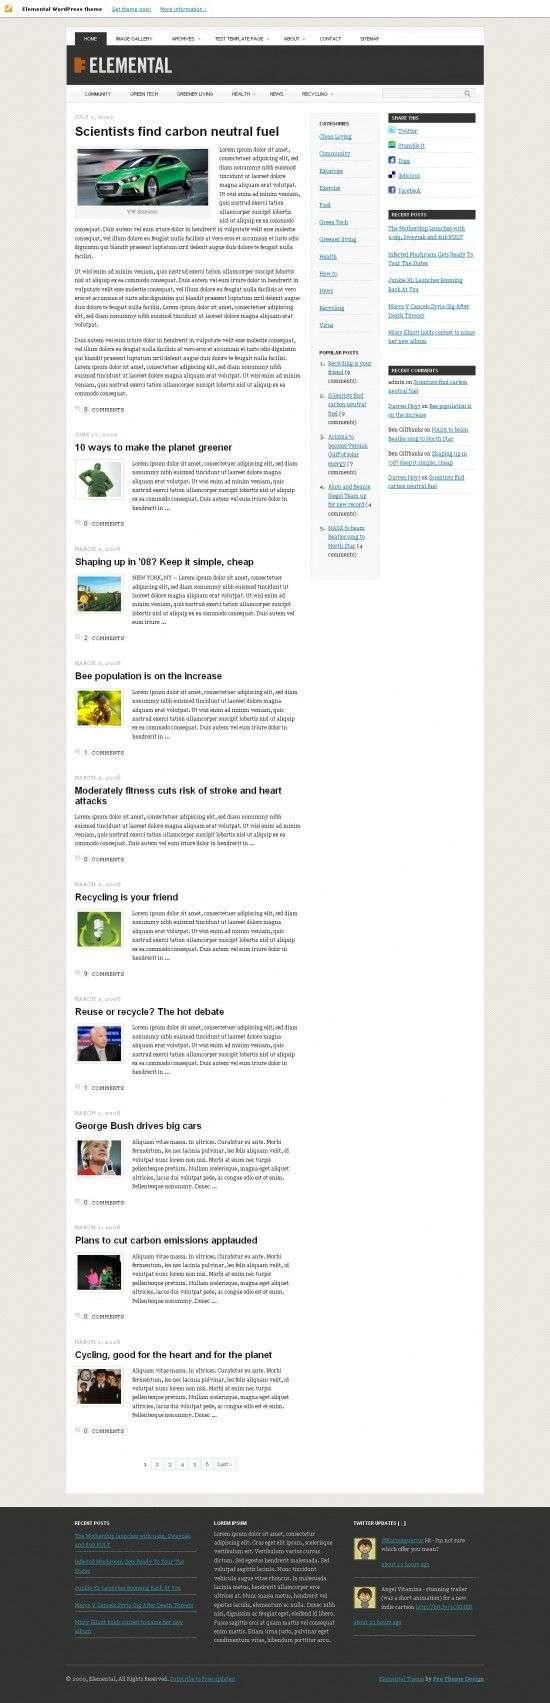 Elemental Prothemedesign avjthemescom 550x1703 - Elemental Premium Wordpress Theme